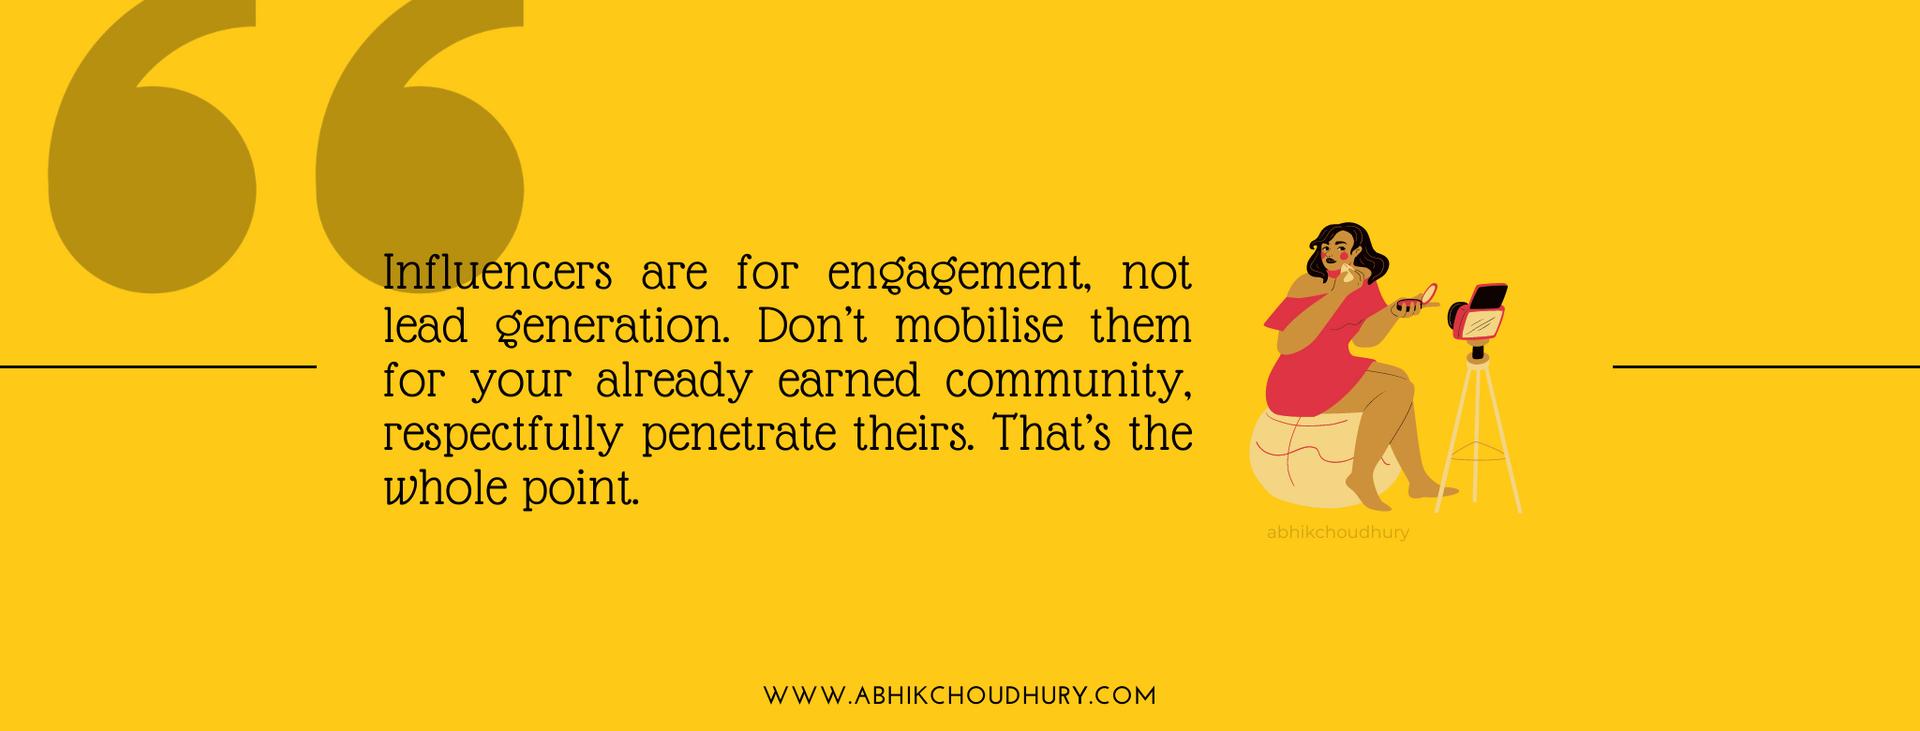 Influencer Marketing Quote Abhik Choudhu